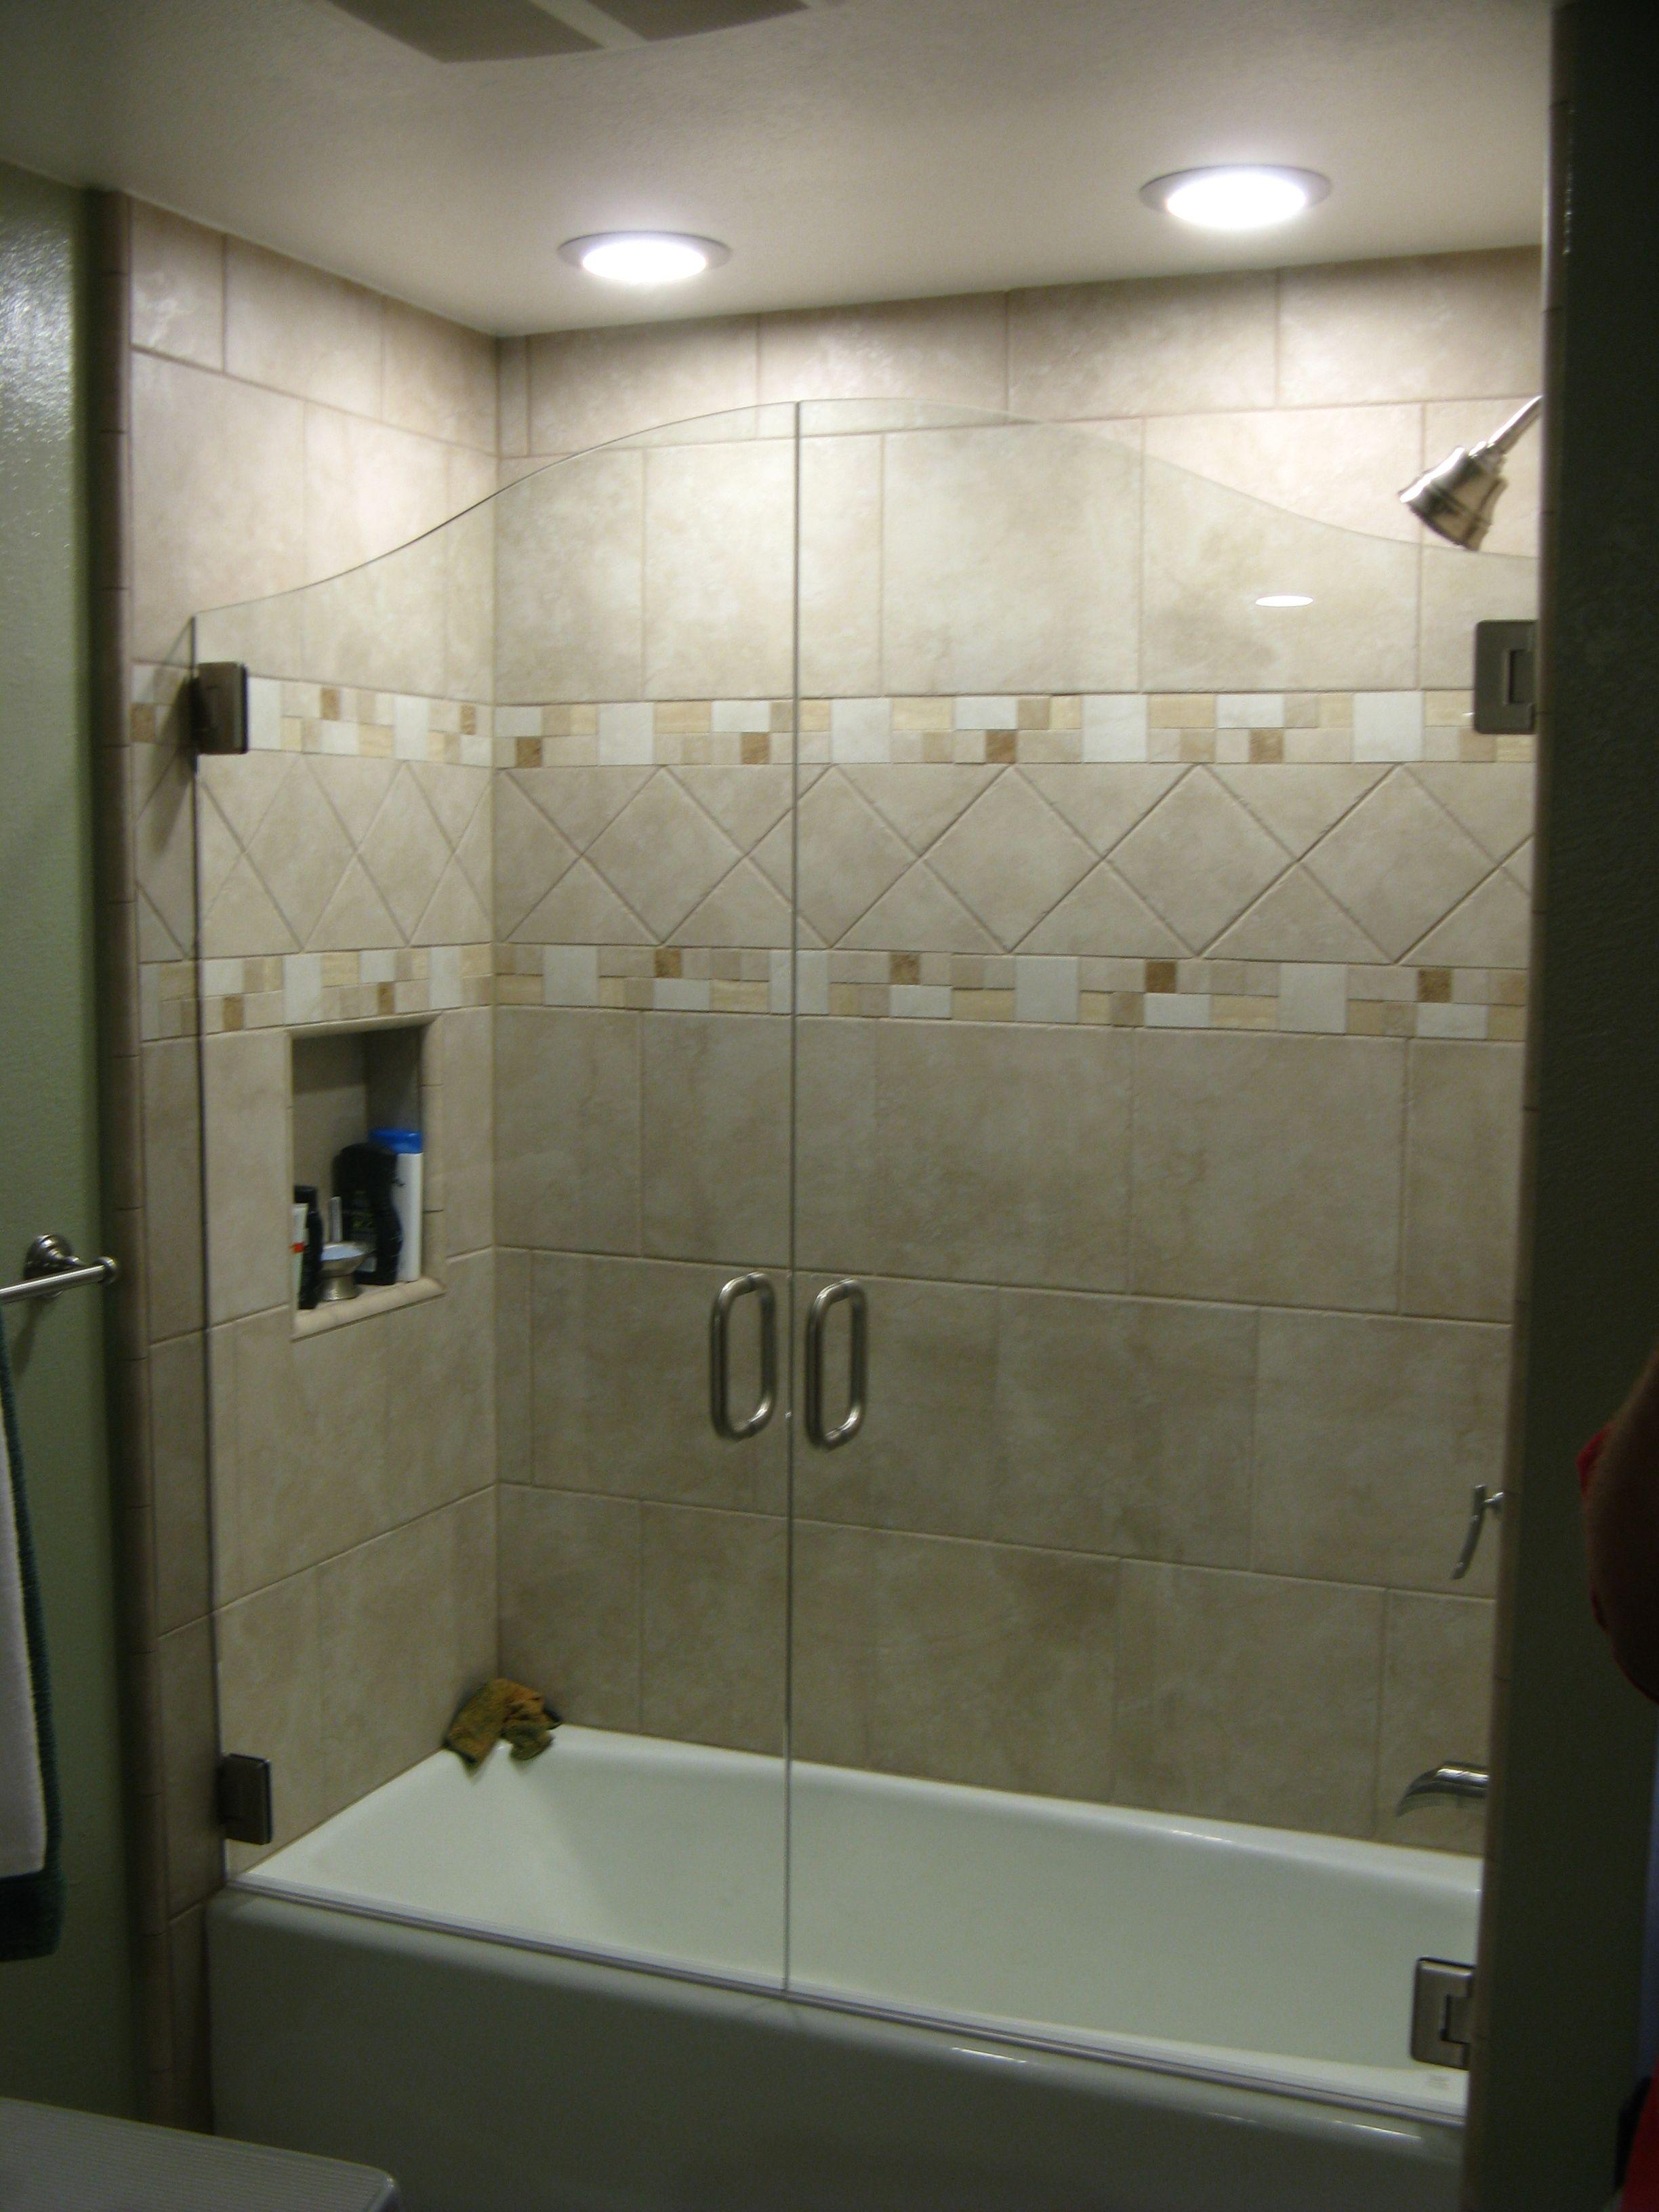 Frameless Shower Door For Bathtub Icsdri Throughout Measurements